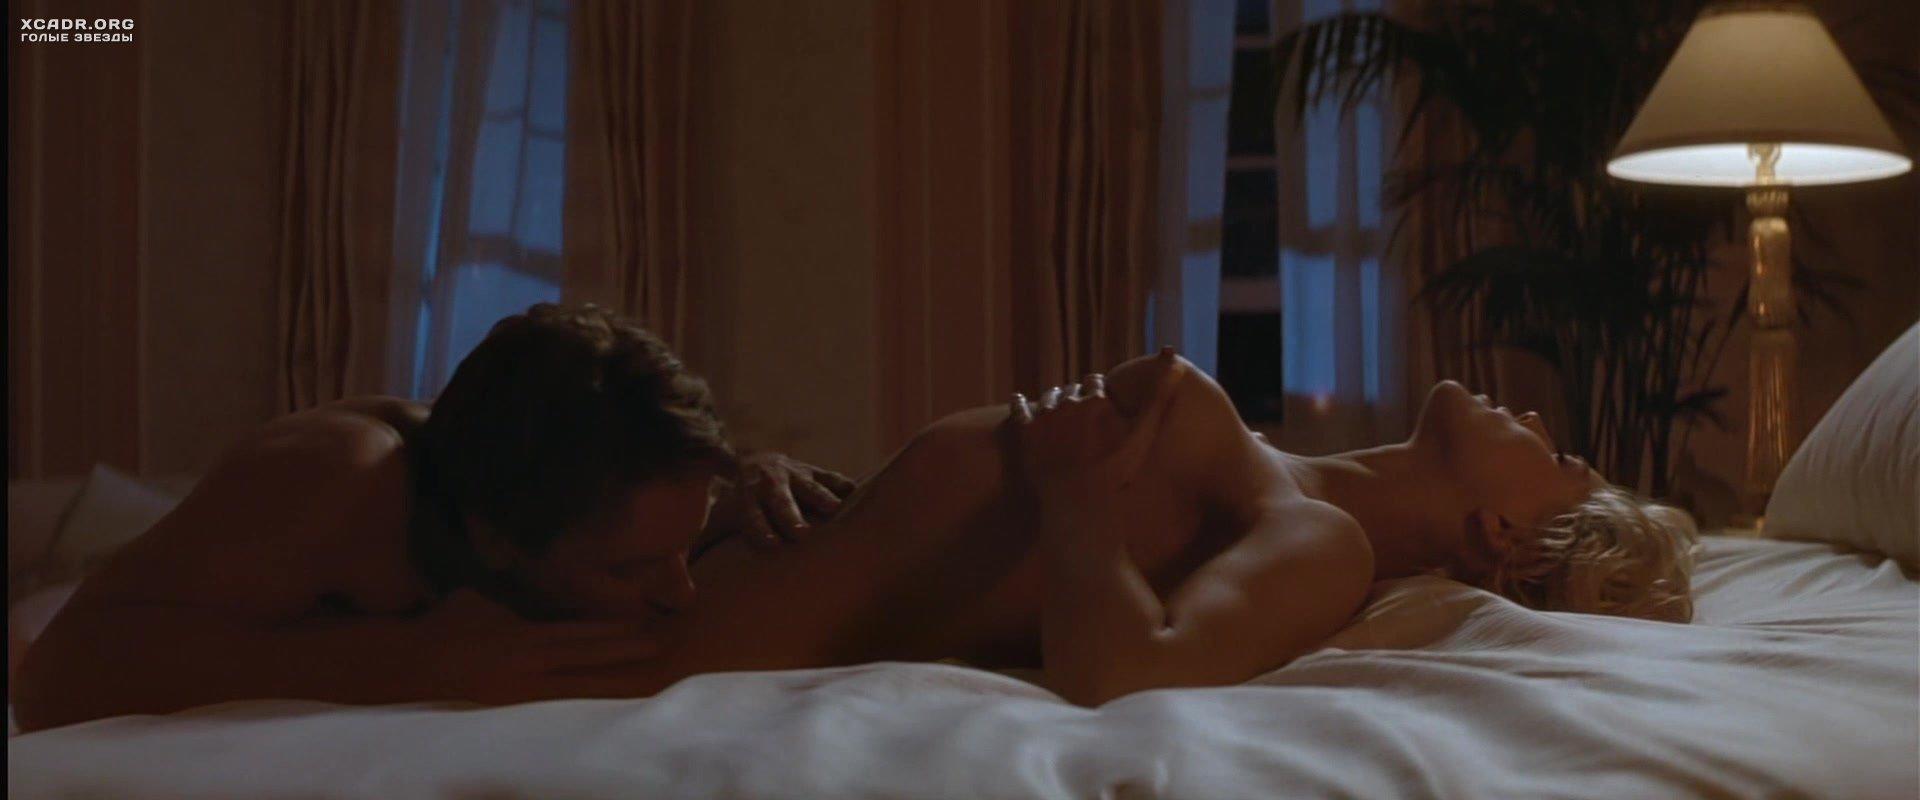 Порно сцены шерон стоун